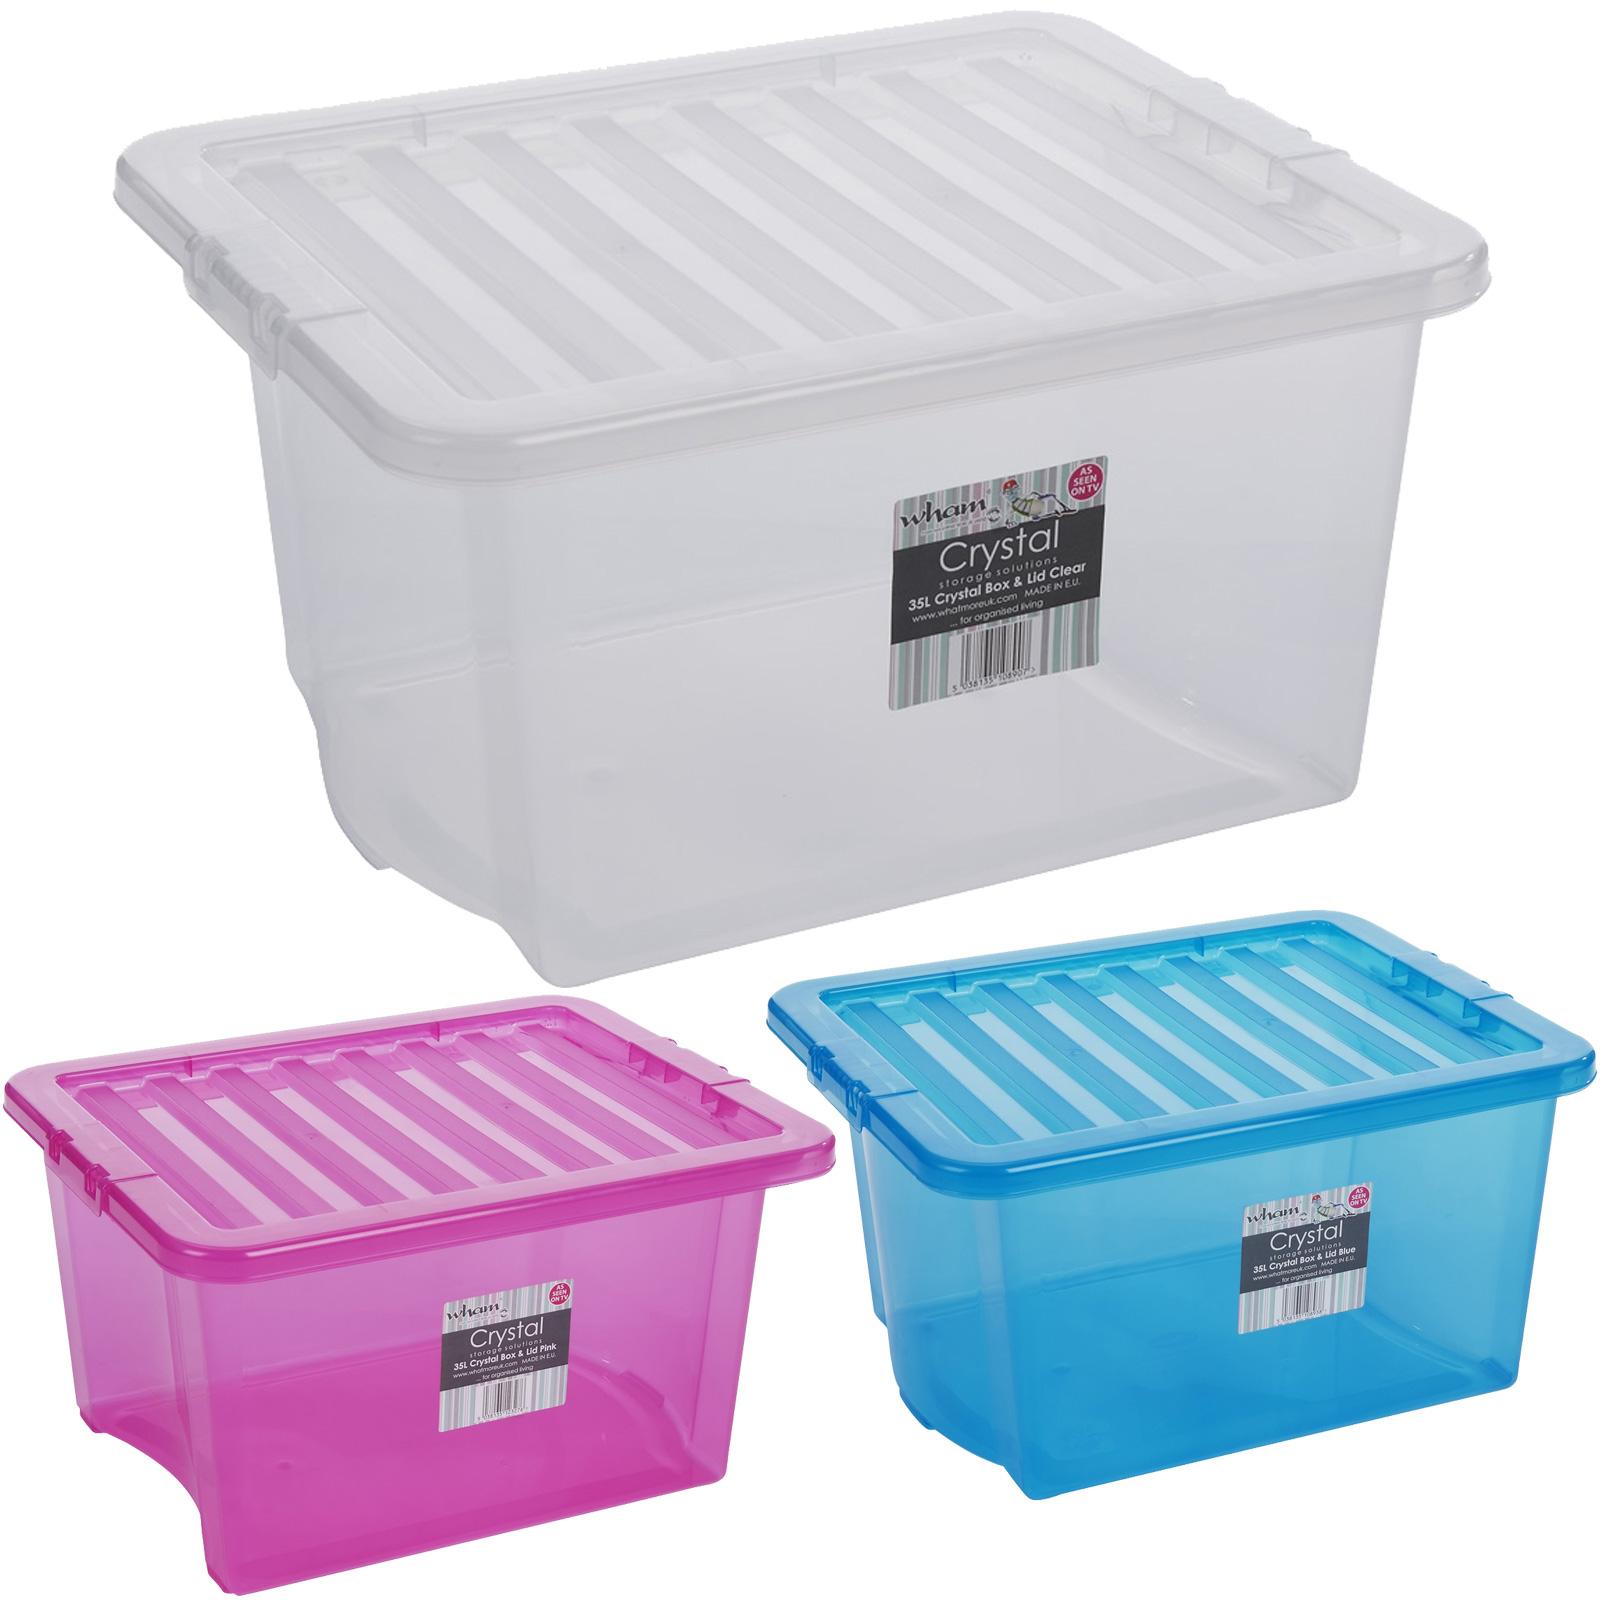 aufbewahrungsbox deckel multifunktions box kunststoff spielzeug stapel kiste xxl ebay. Black Bedroom Furniture Sets. Home Design Ideas